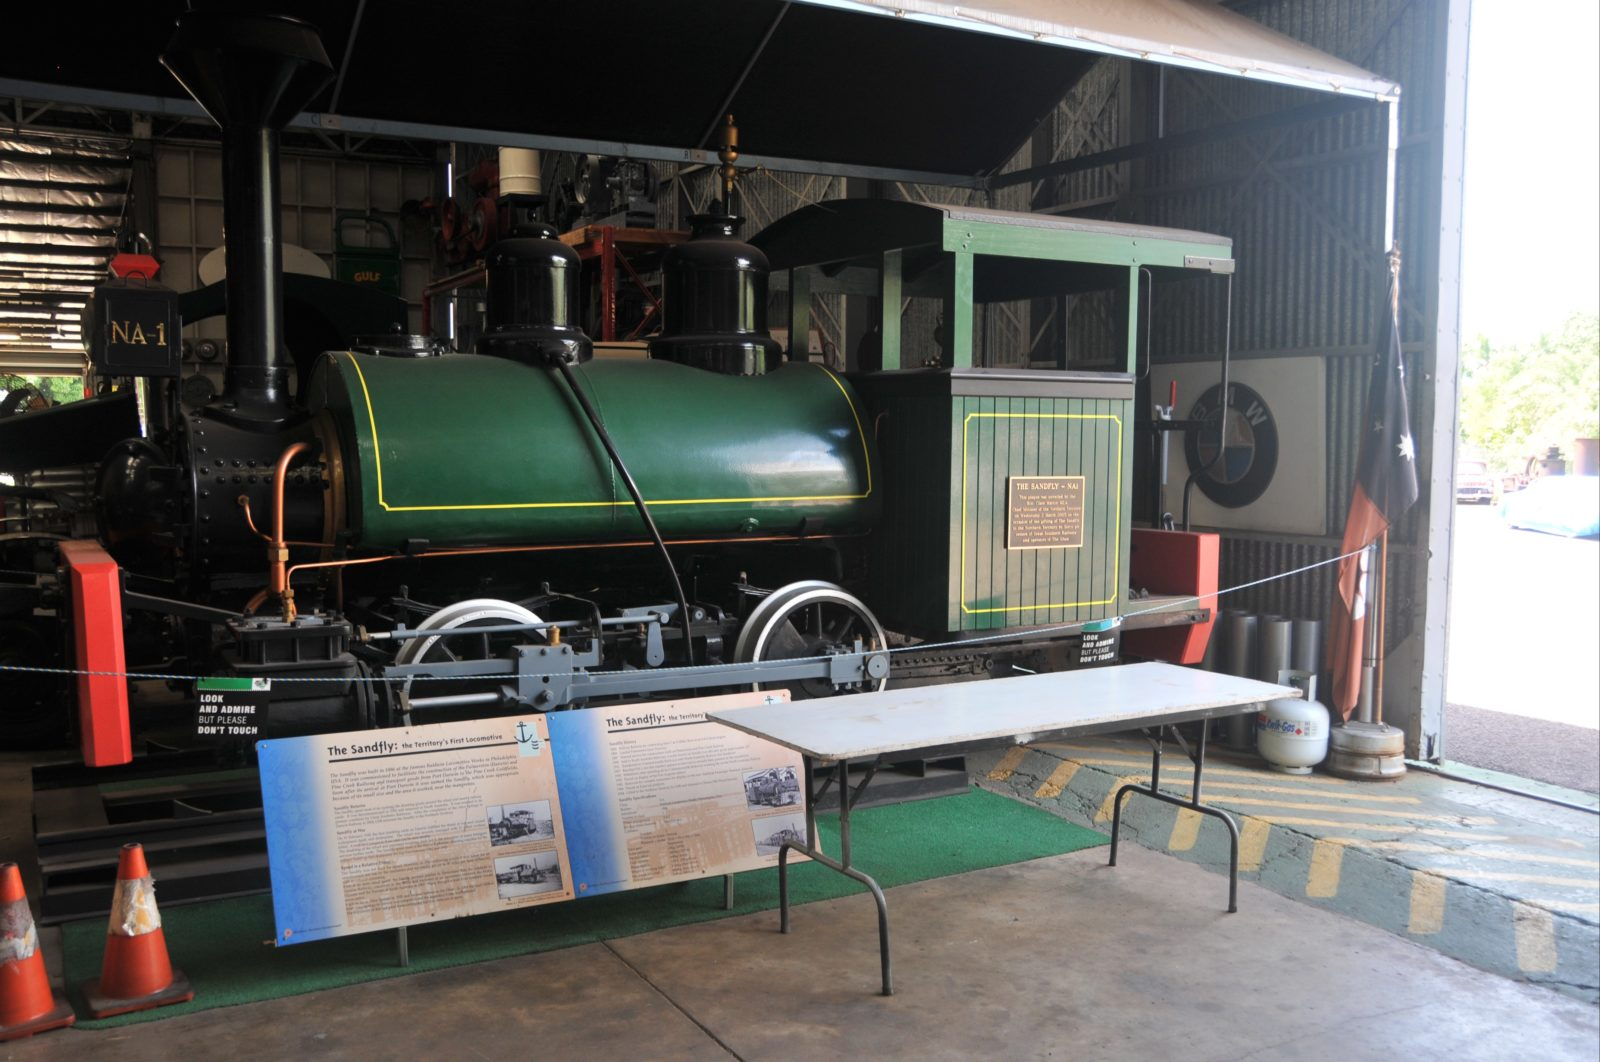 Steam locomotive in the Qantas Hangar.